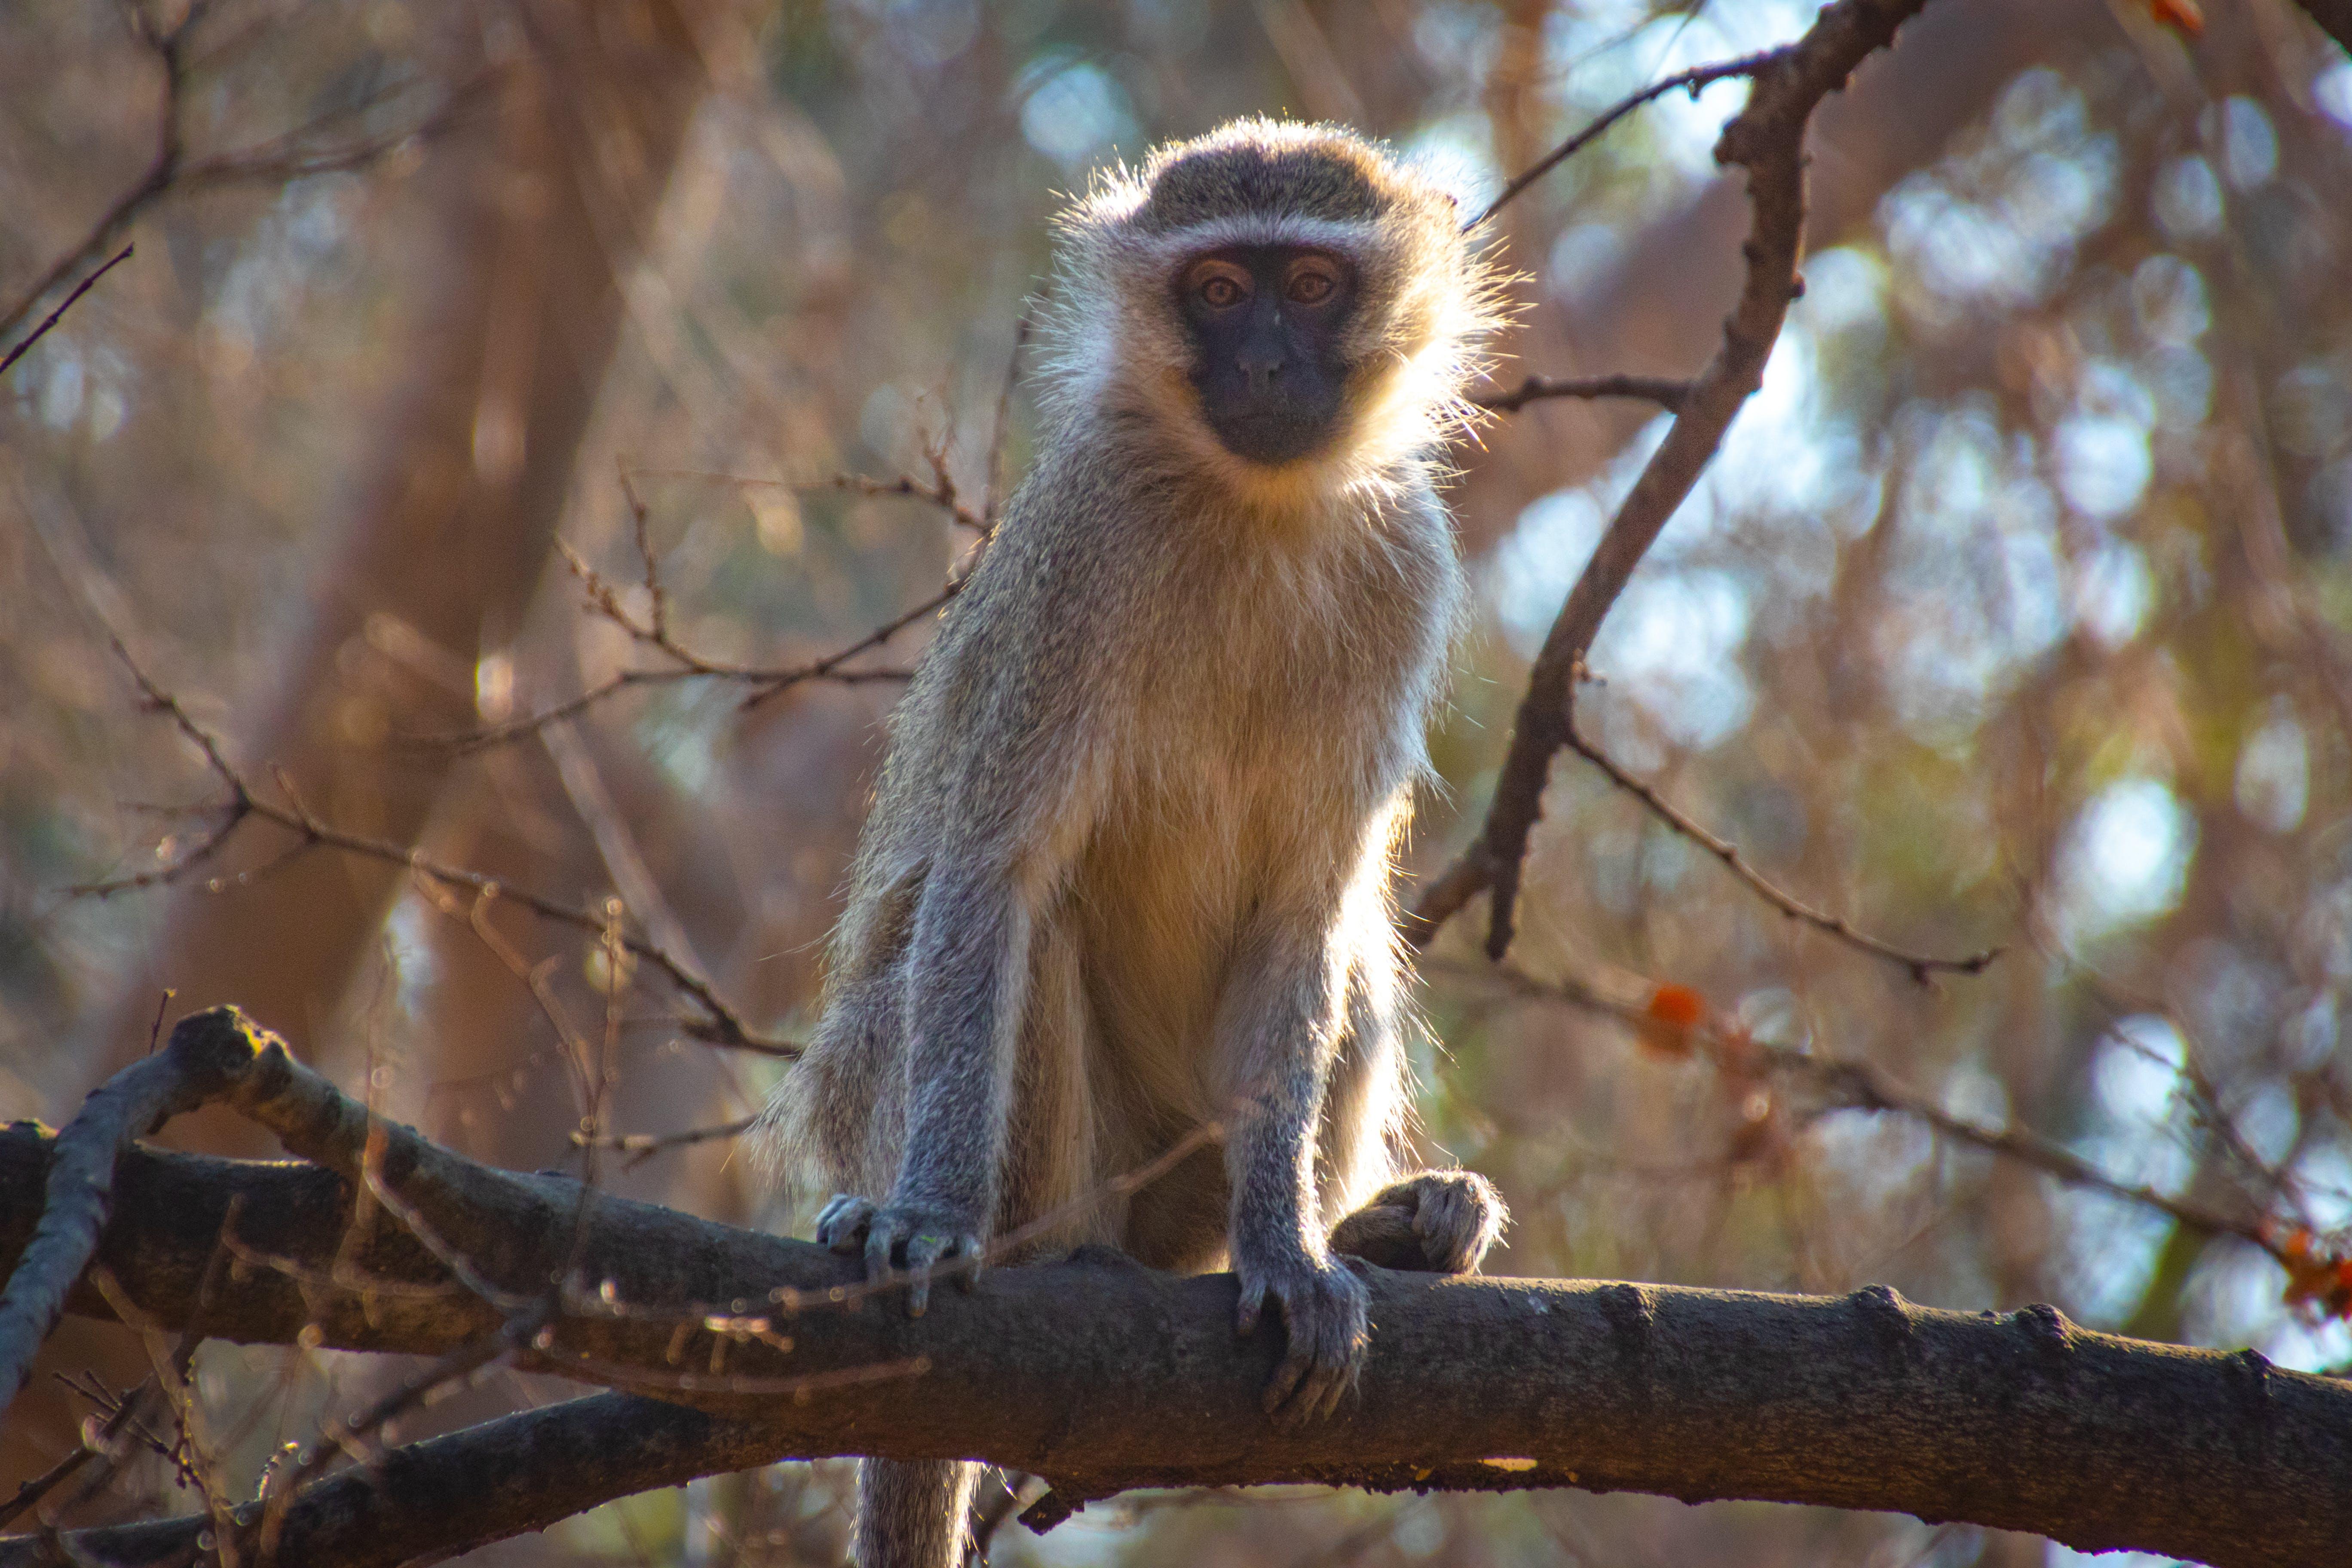 Beige Chimpanzee on Focus Photo